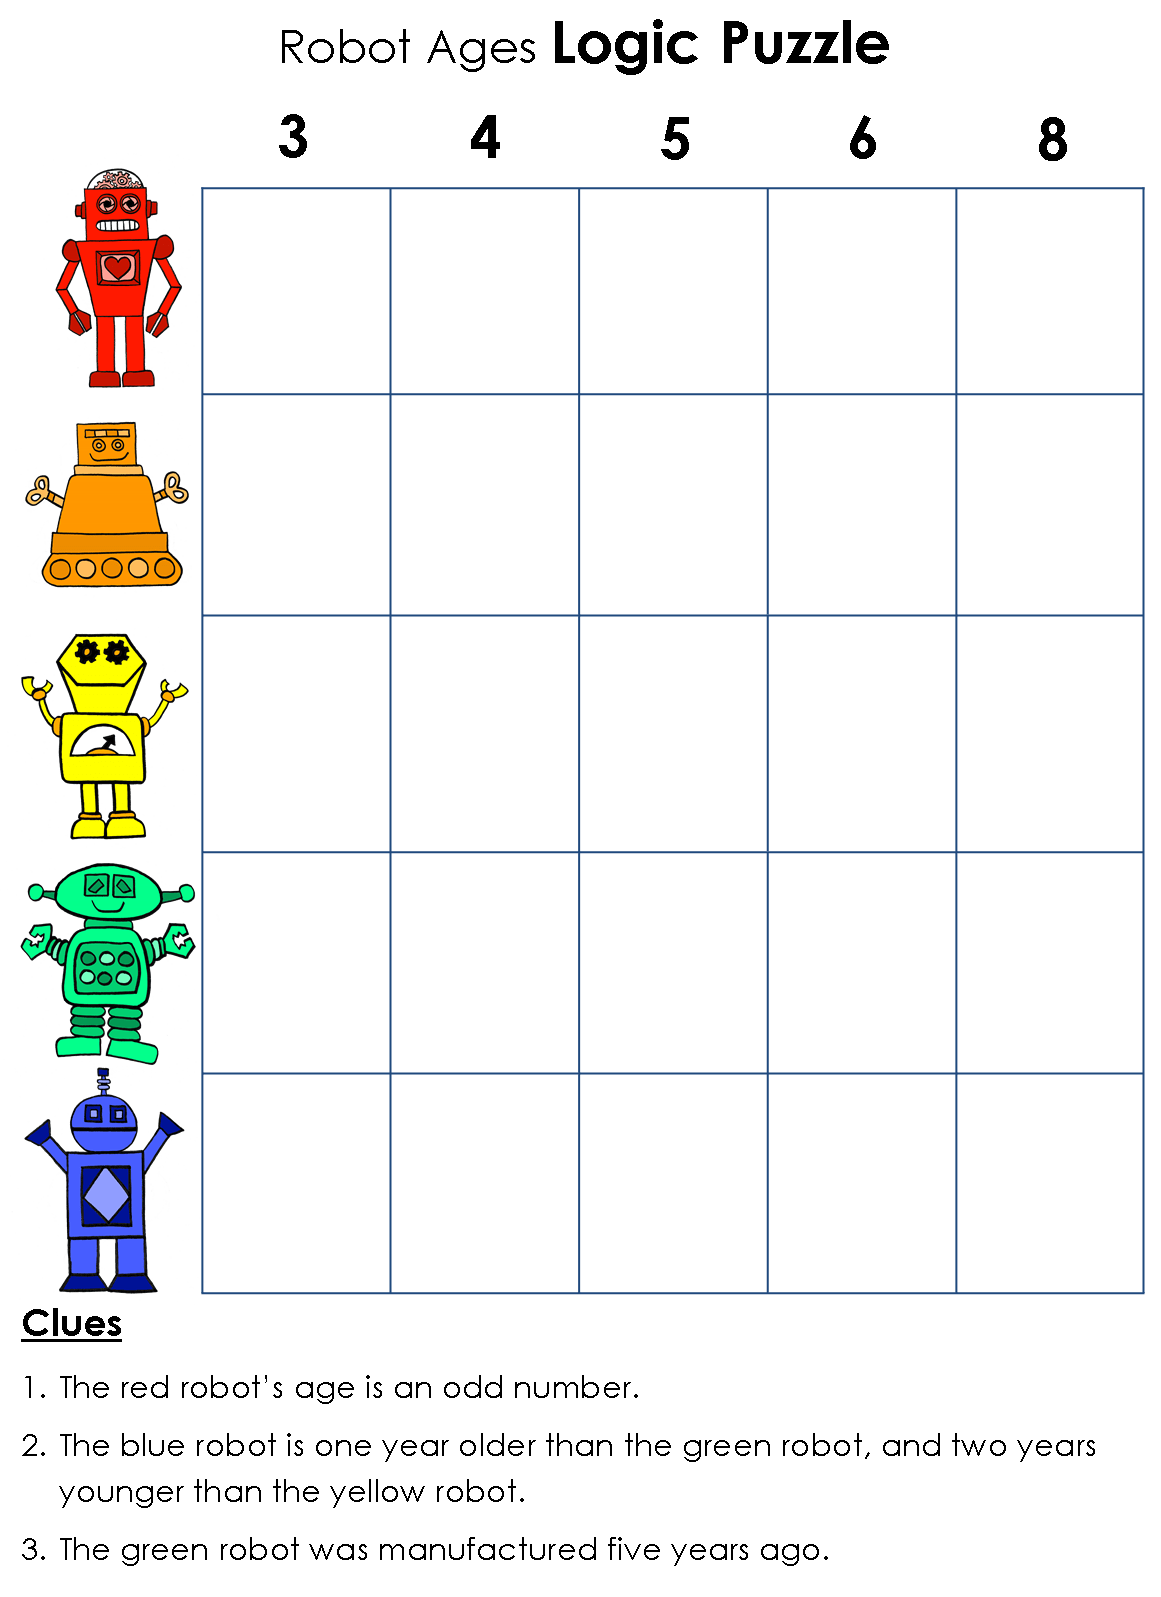 Logic Puzzle Robot